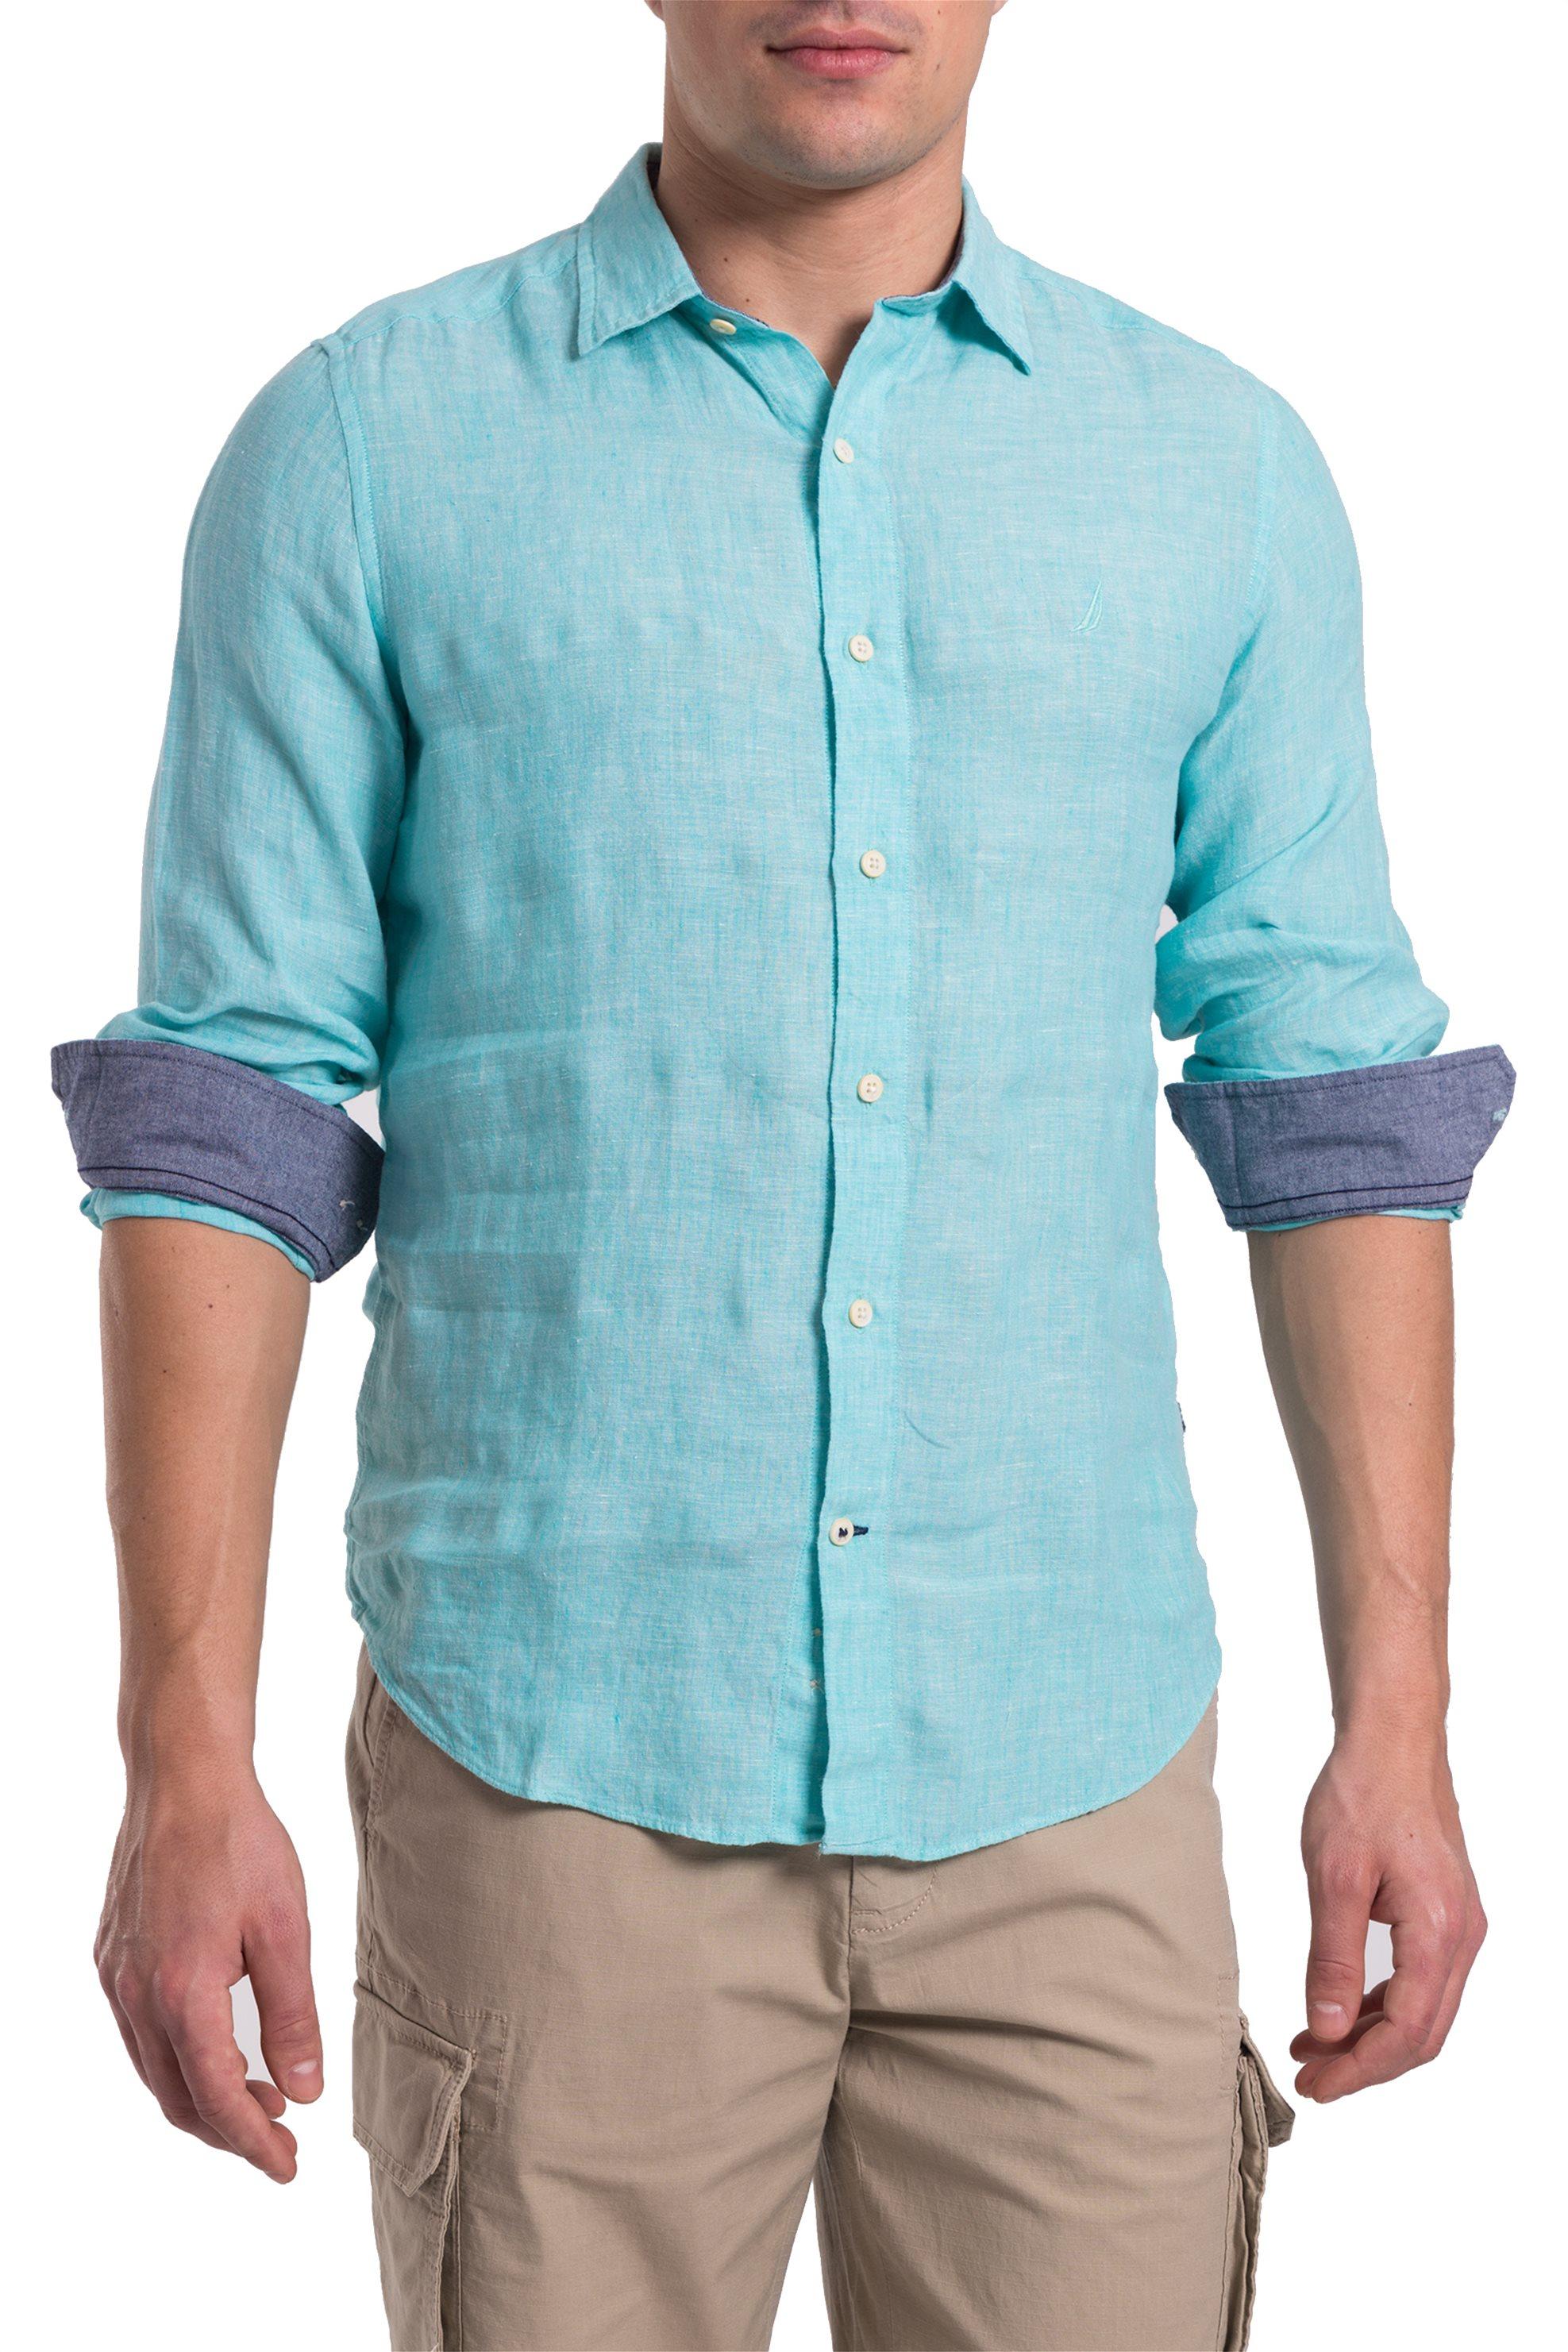 fc91b9e50620 Notos Ανδρικό μονόχρωμο πουκάμισο Nautica - W74112 - Βεραμάν